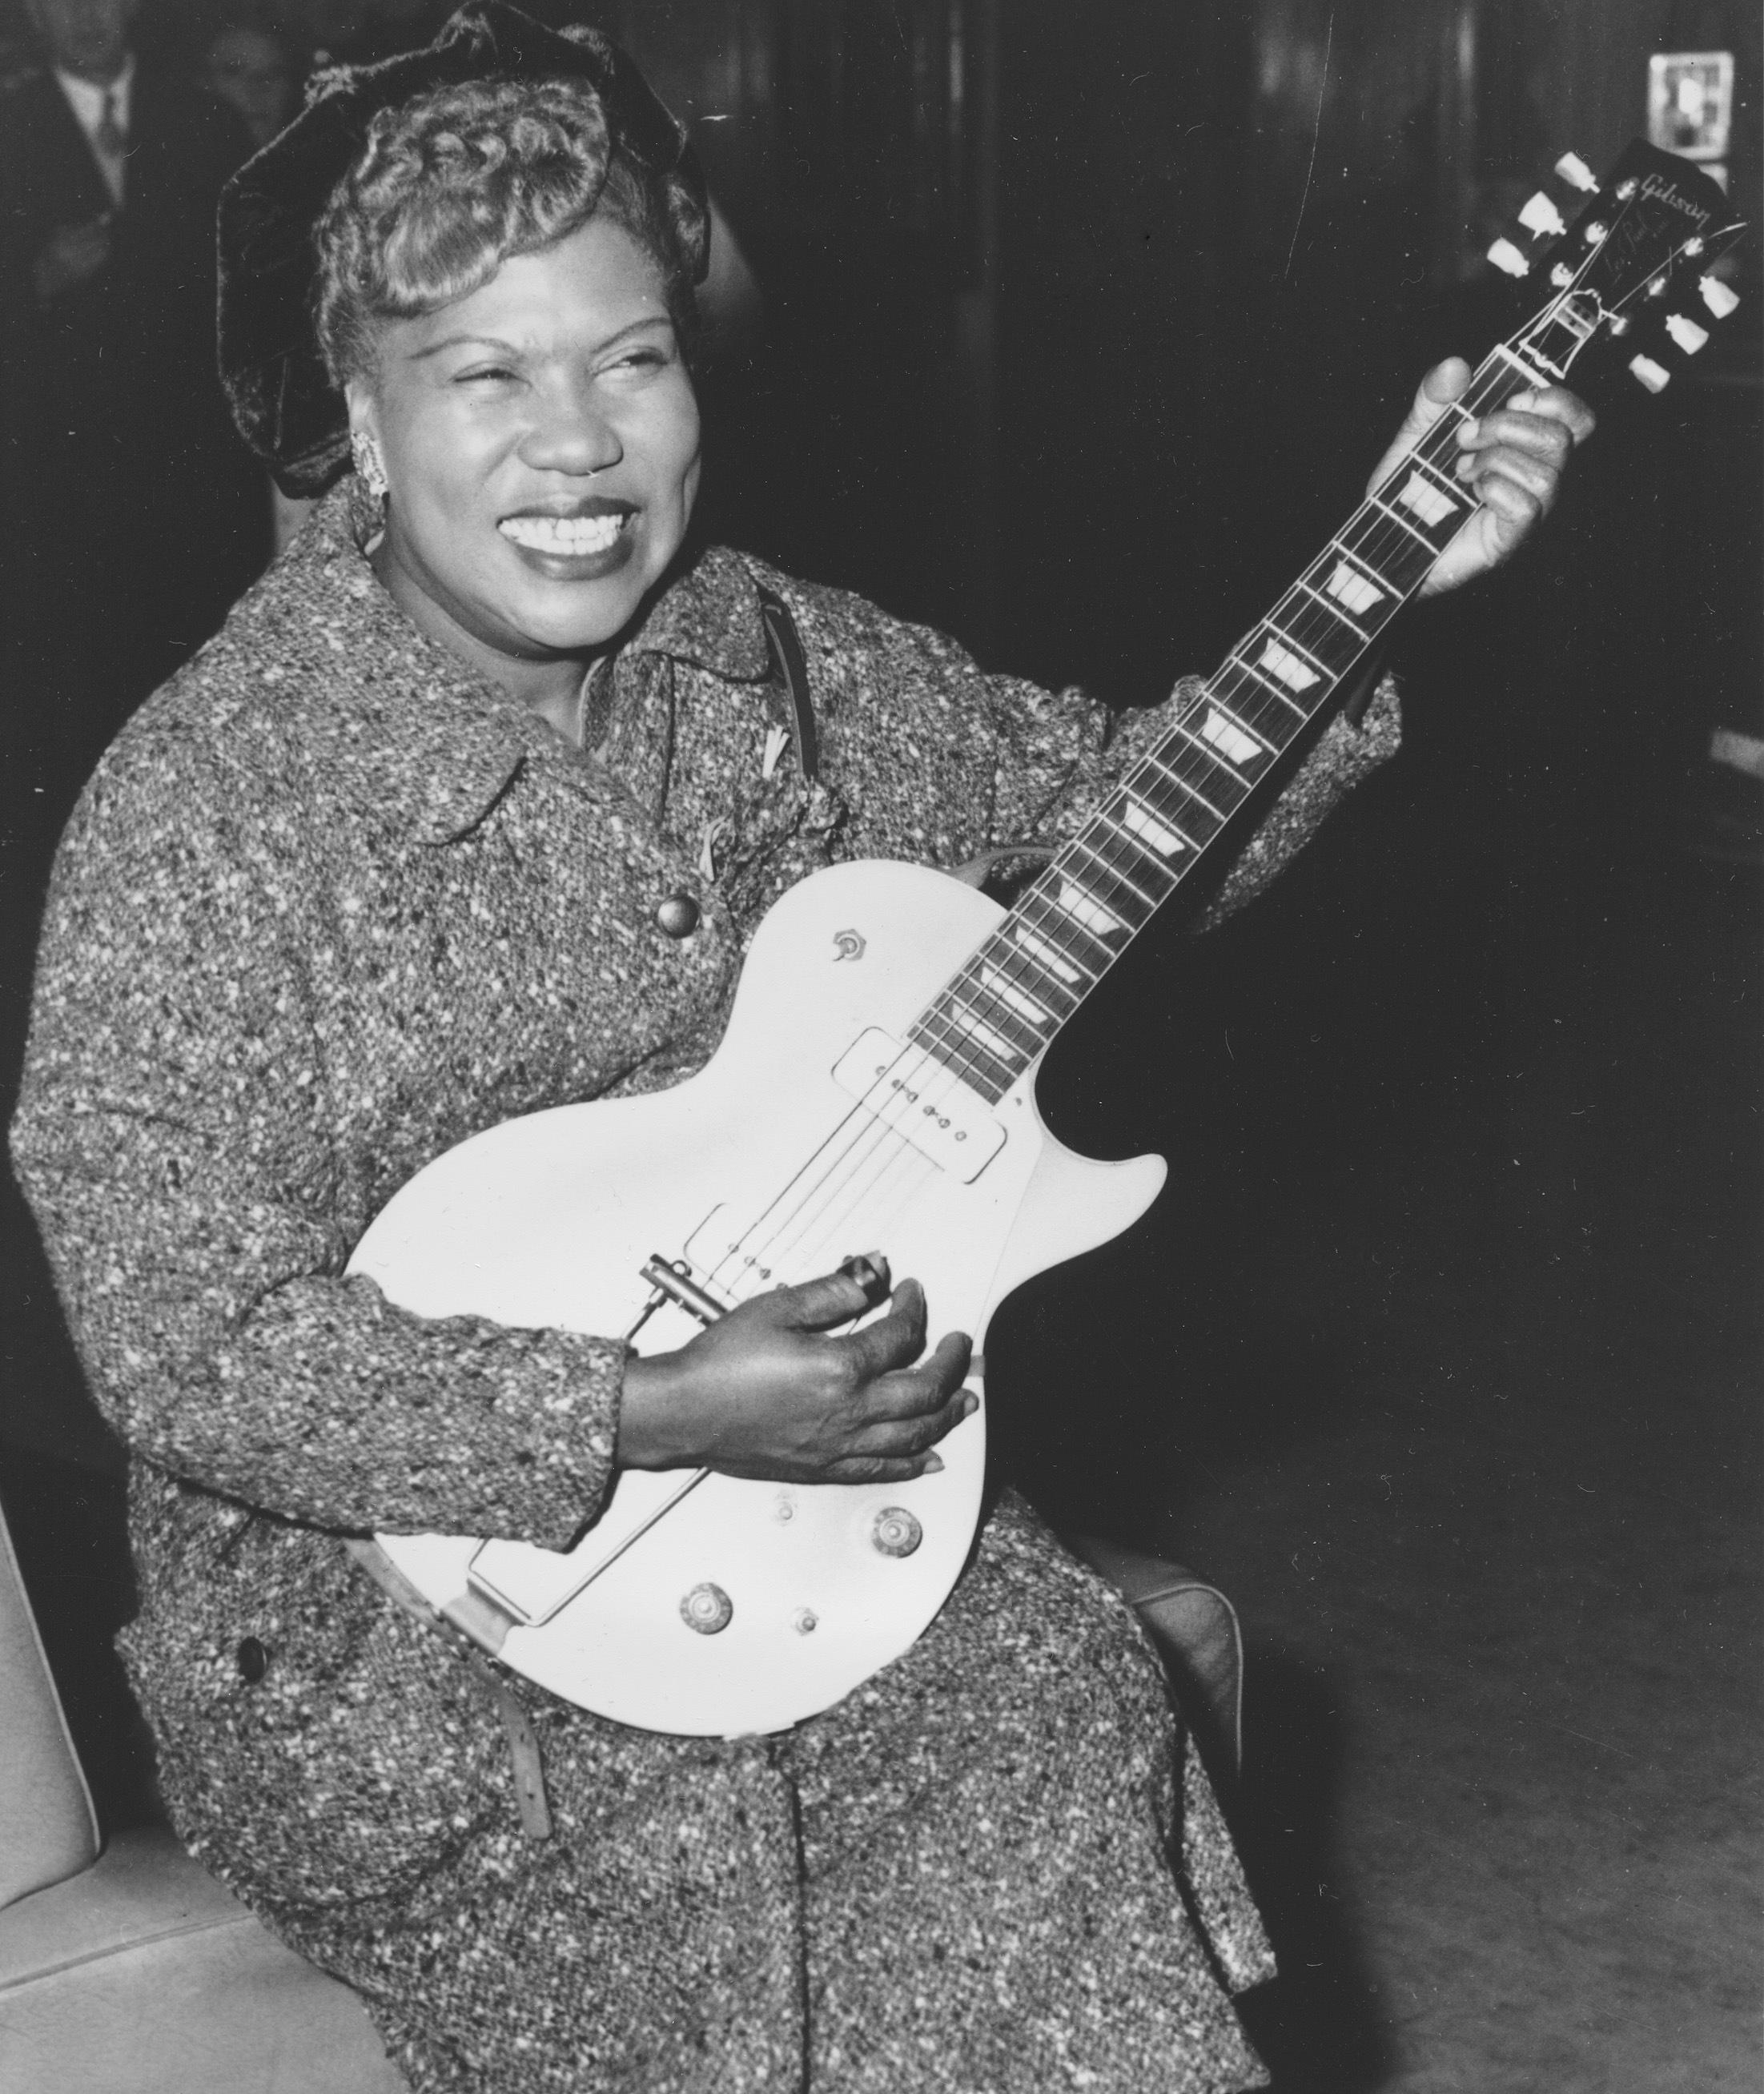 Sister Rosetta Tharpe smiling with her guitar